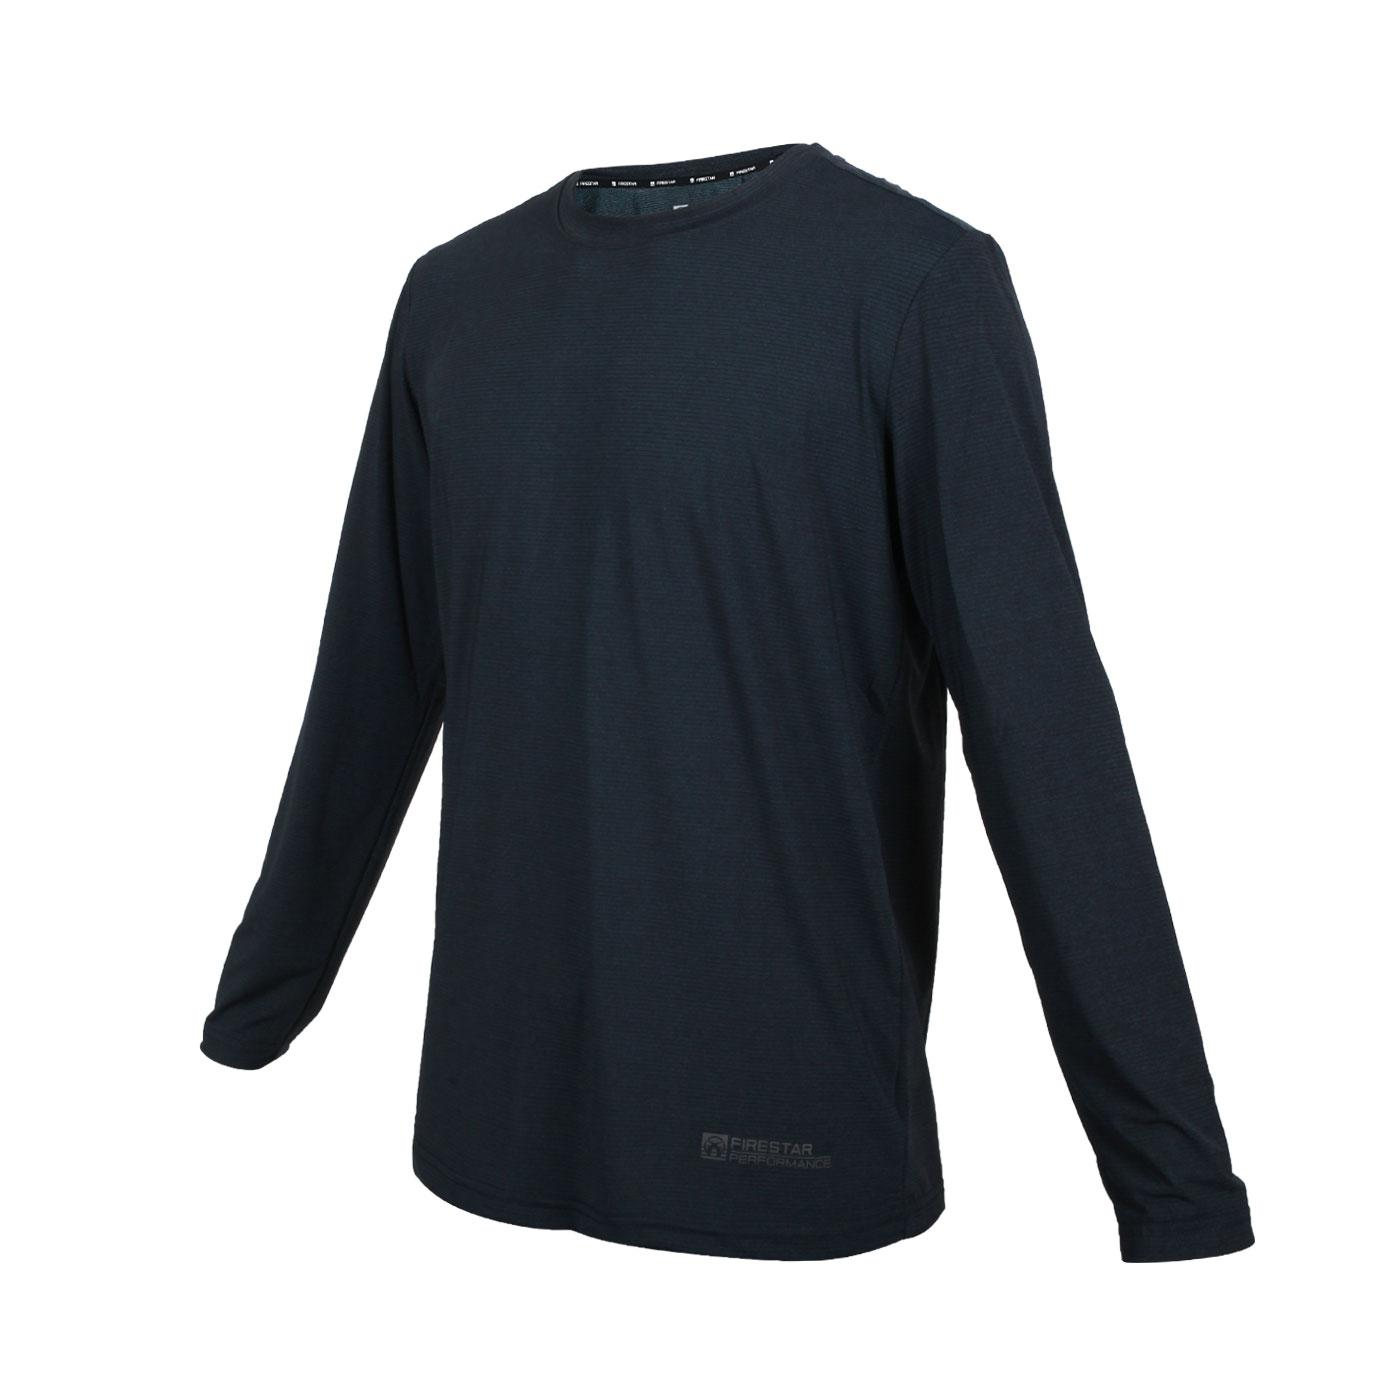 FIRESTAR 男彈性圓領長袖T恤 D0605-98 - 墨藍灰